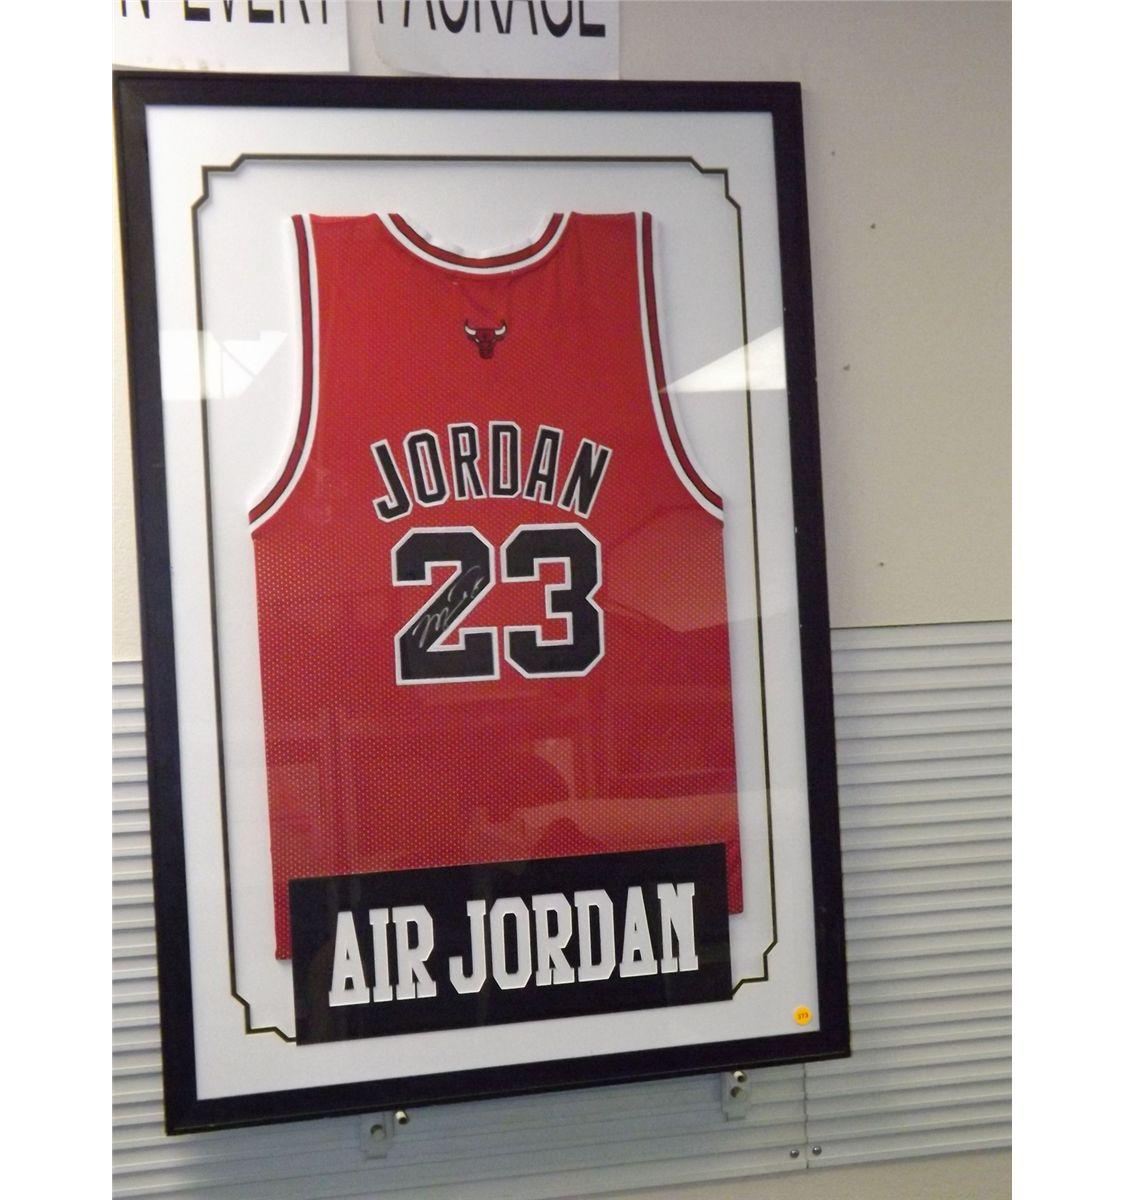 ce09ff4351c801 Image 1   Michael Jordan Autographed Jersey. Framed Chicago Bulls  23 Basketball  Jersey